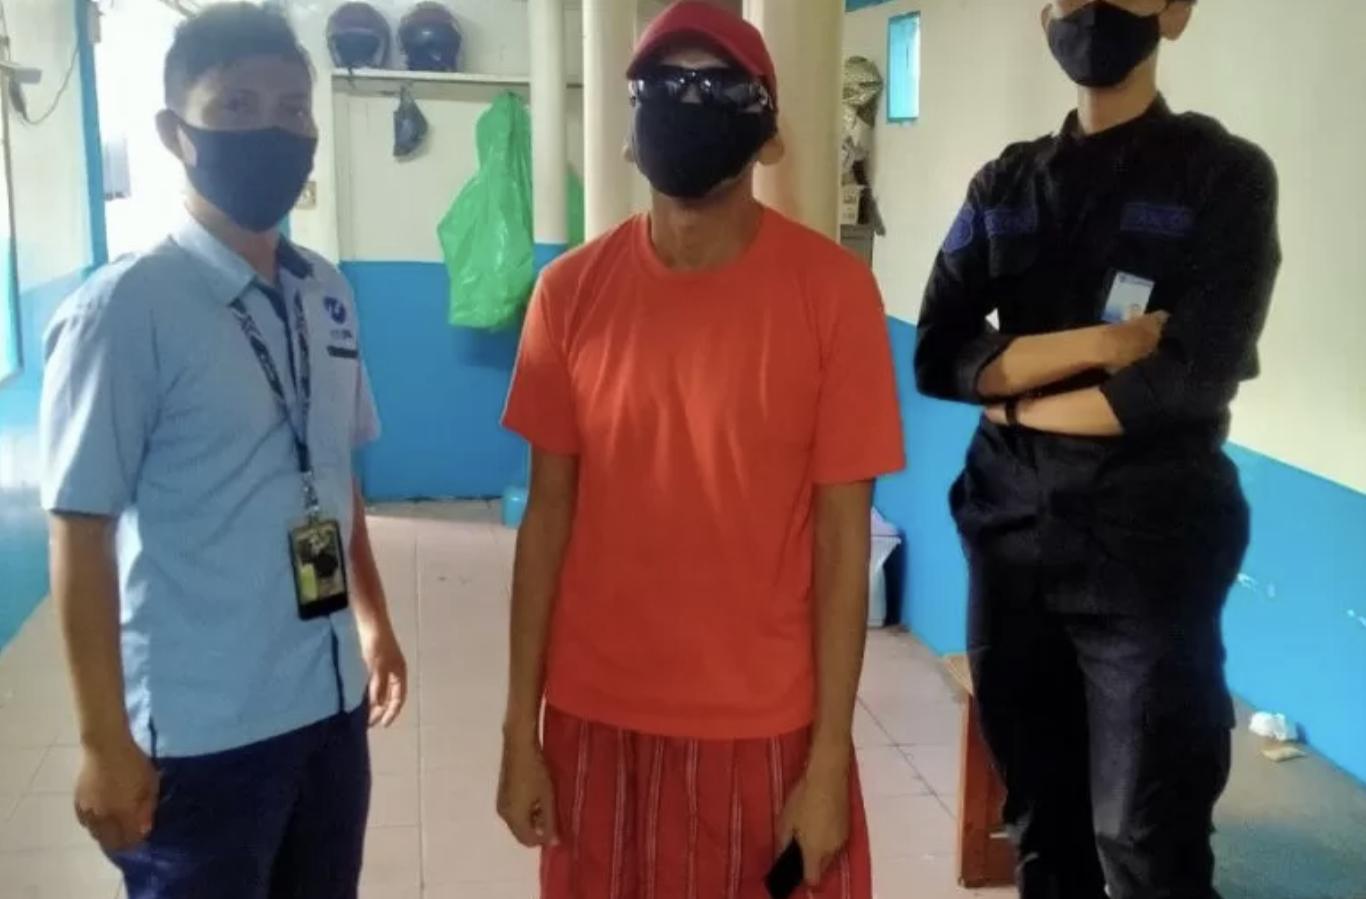 https: img.okezone.com content 2021 01 24 338 2350037 pencuri-hand-sanitizer-di-bus-transjakarta-ditangkap-H6ZtfPOqeM.jpeg